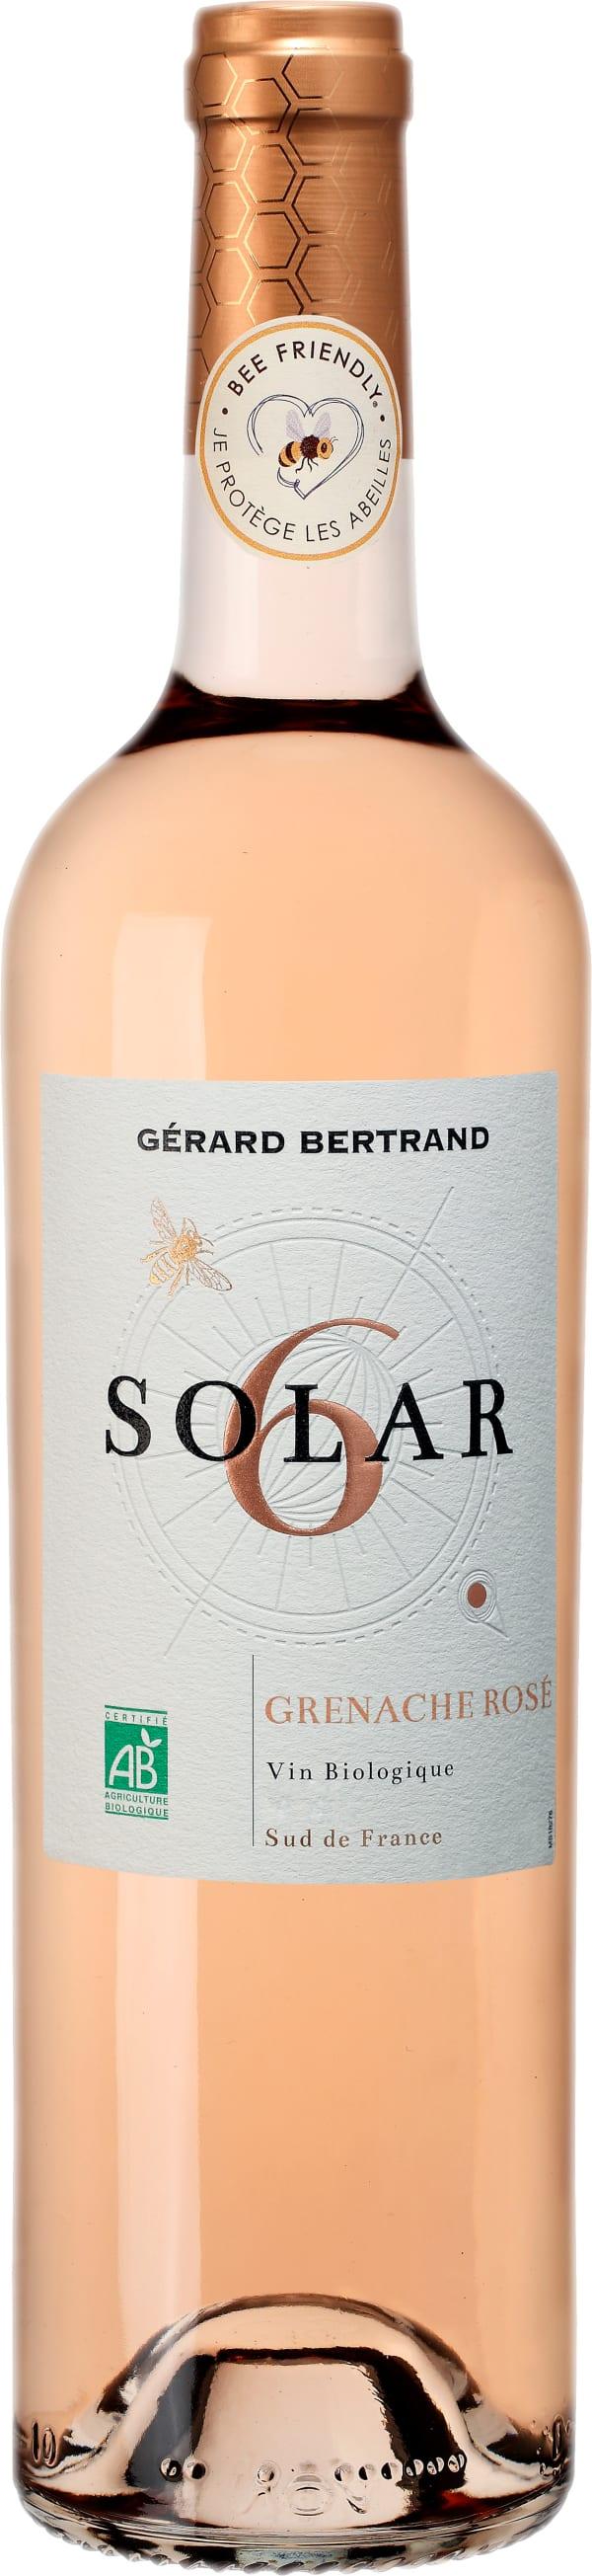 Gérard Bertrand Solar 6 Bee Friendly Rosé Grenache 2019